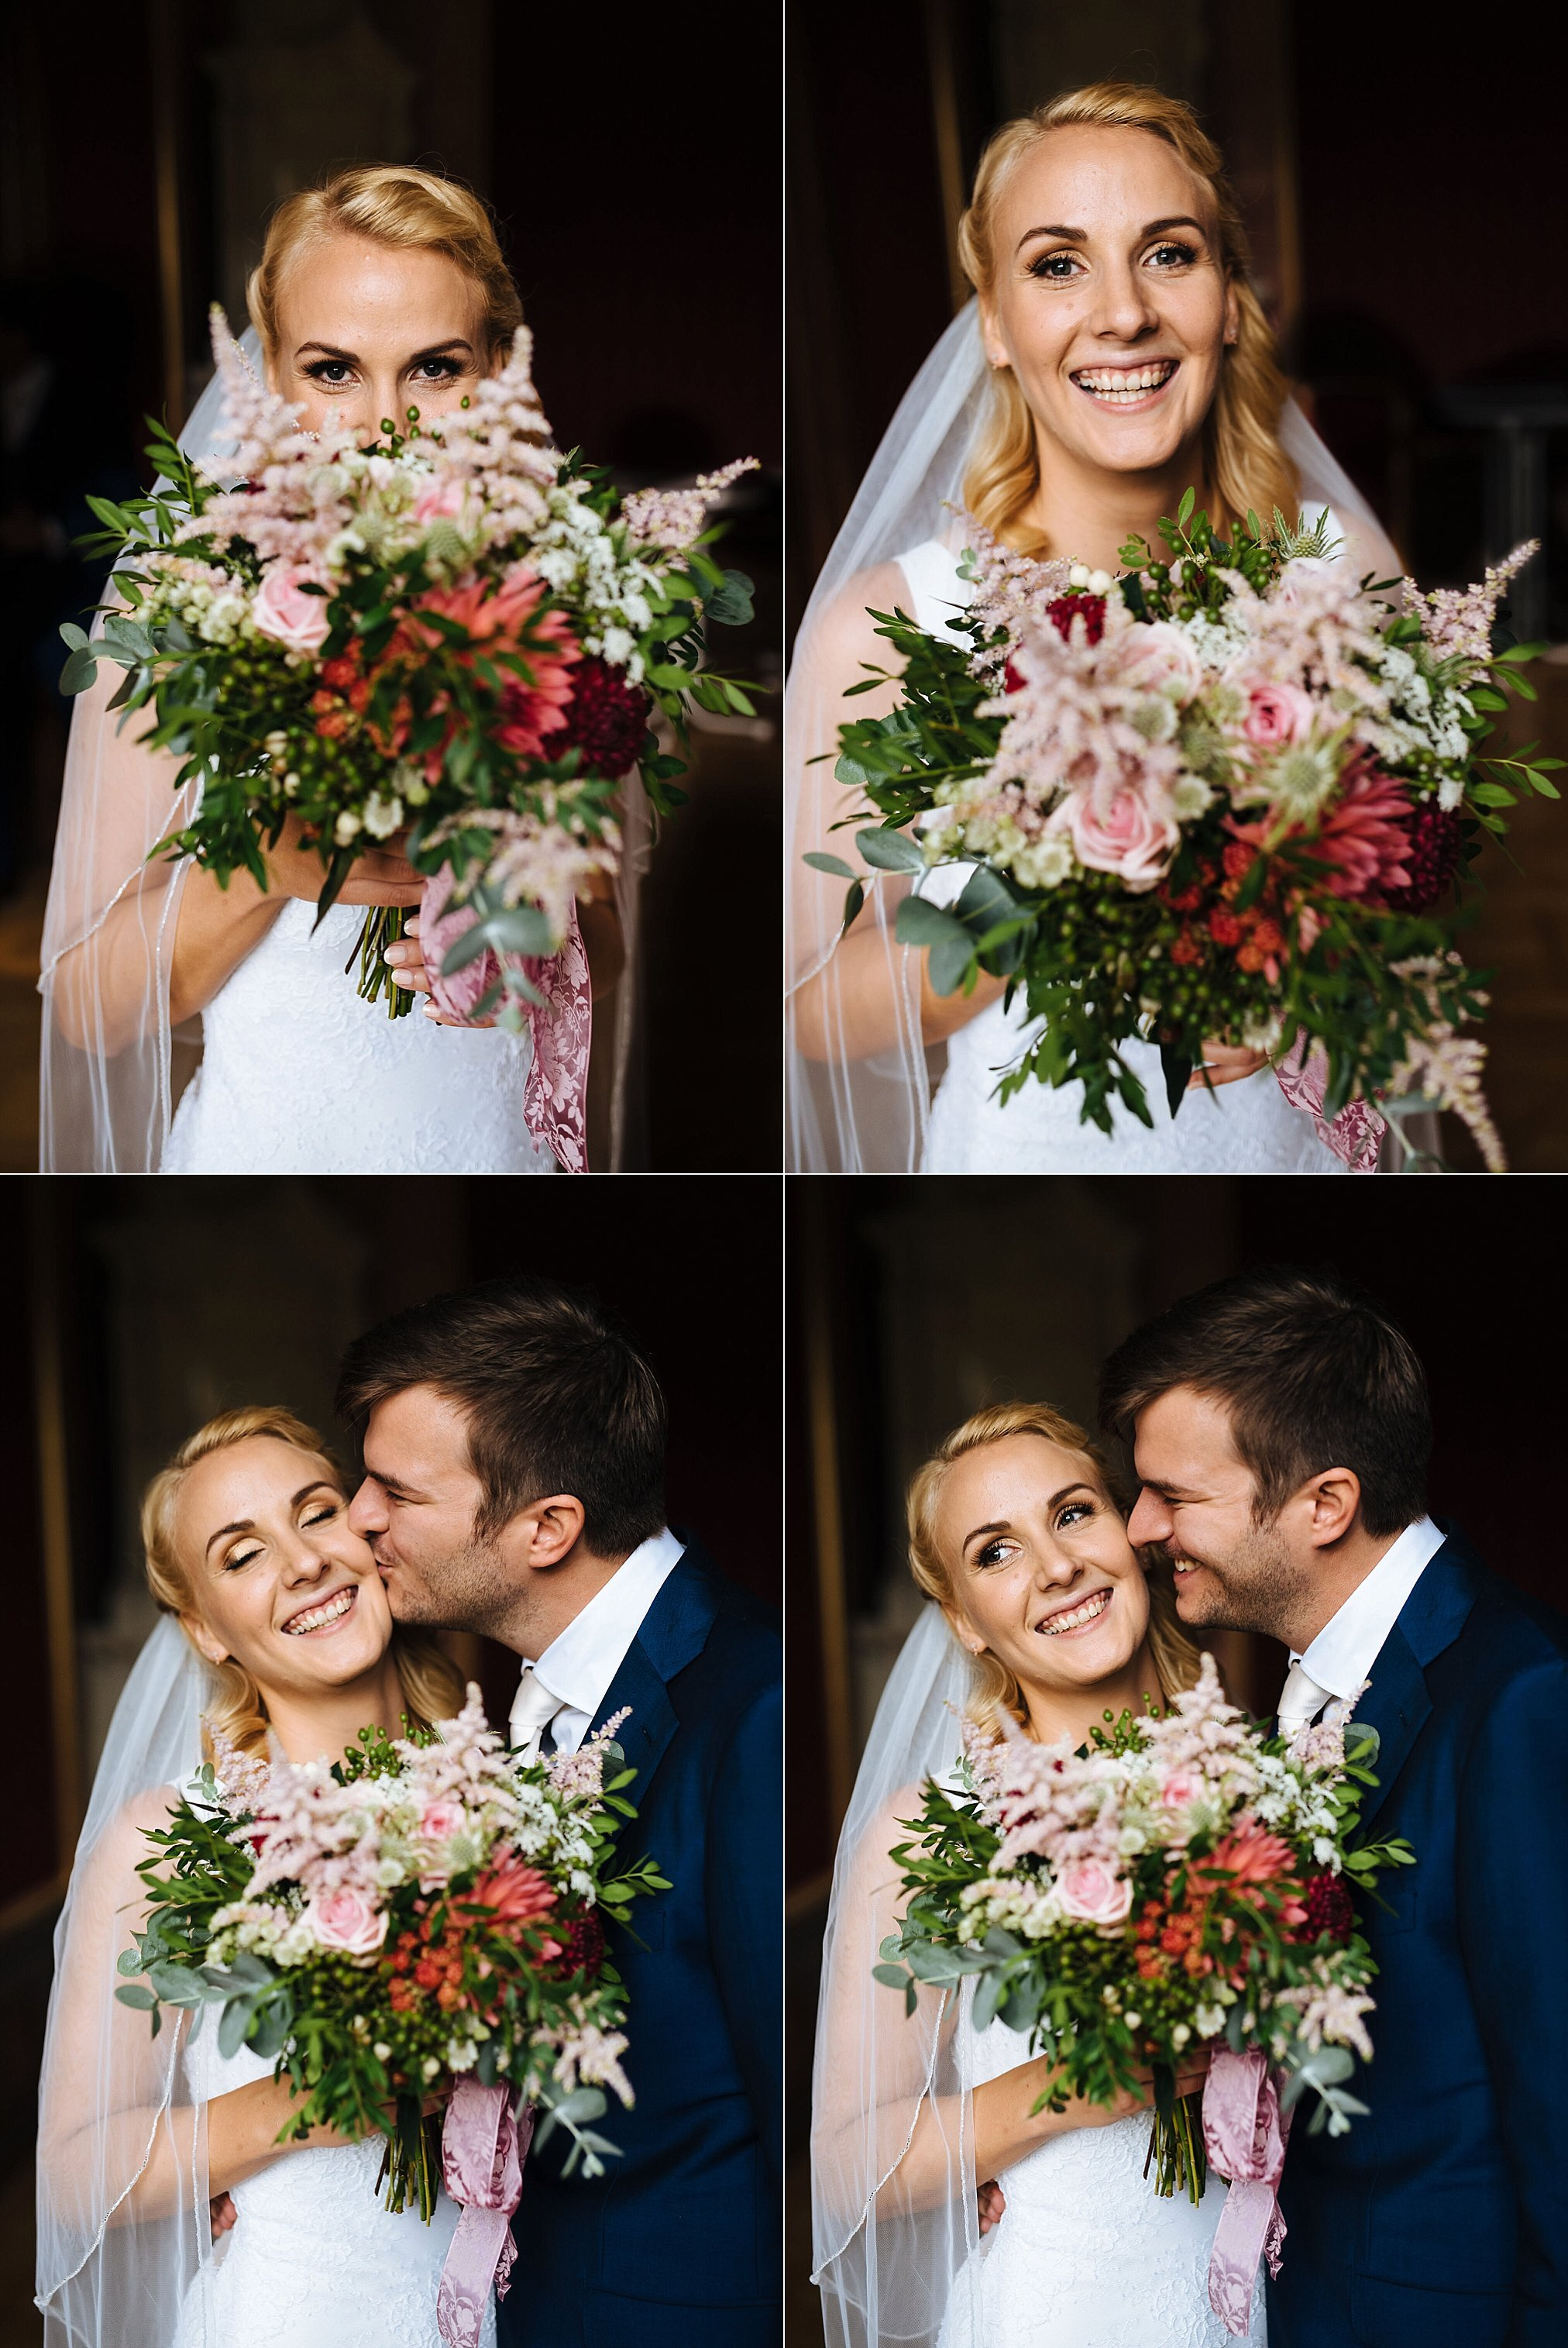 Hochzeit-Shloss-Grafenegg_0110.jpg